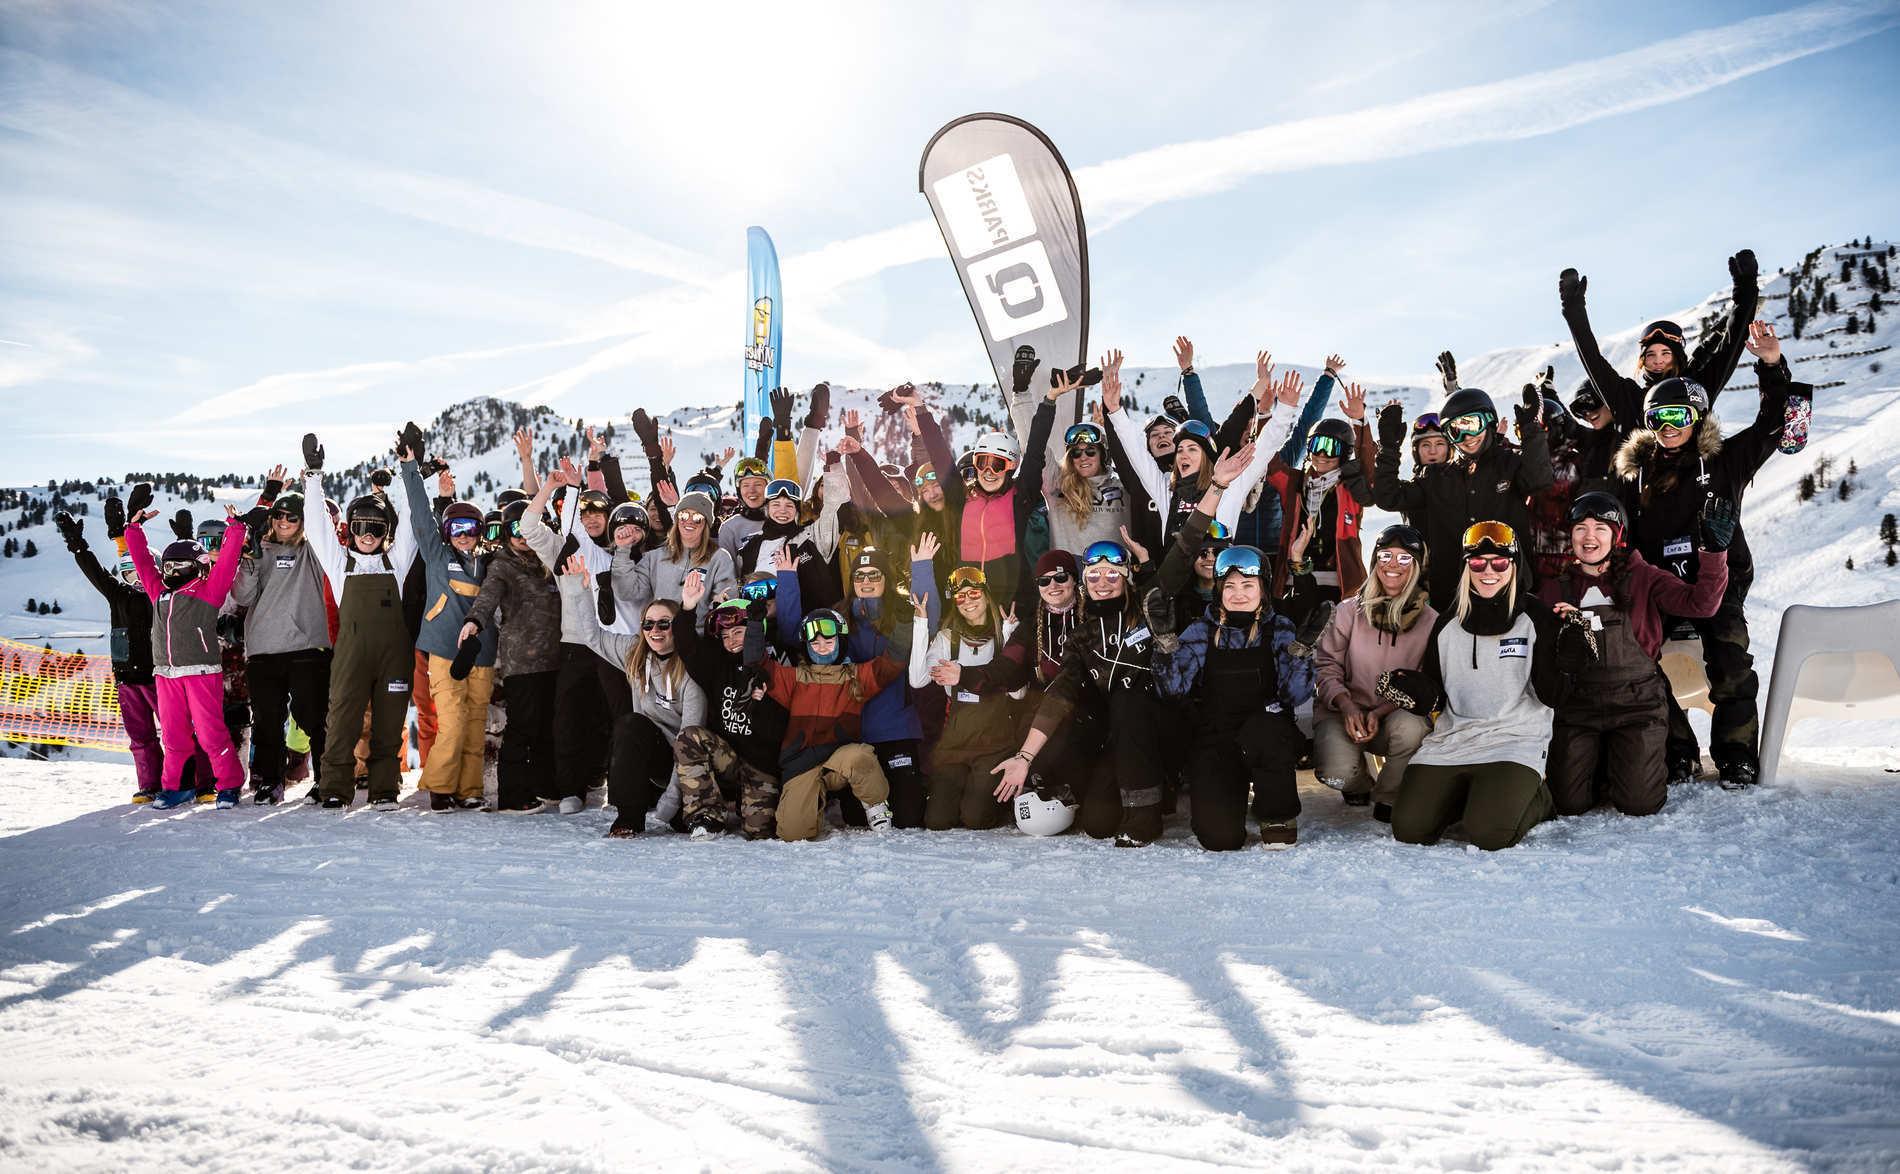 web mayrhofen 16 02 2019 lifestyle fs sb christian riefenberg qparks 16